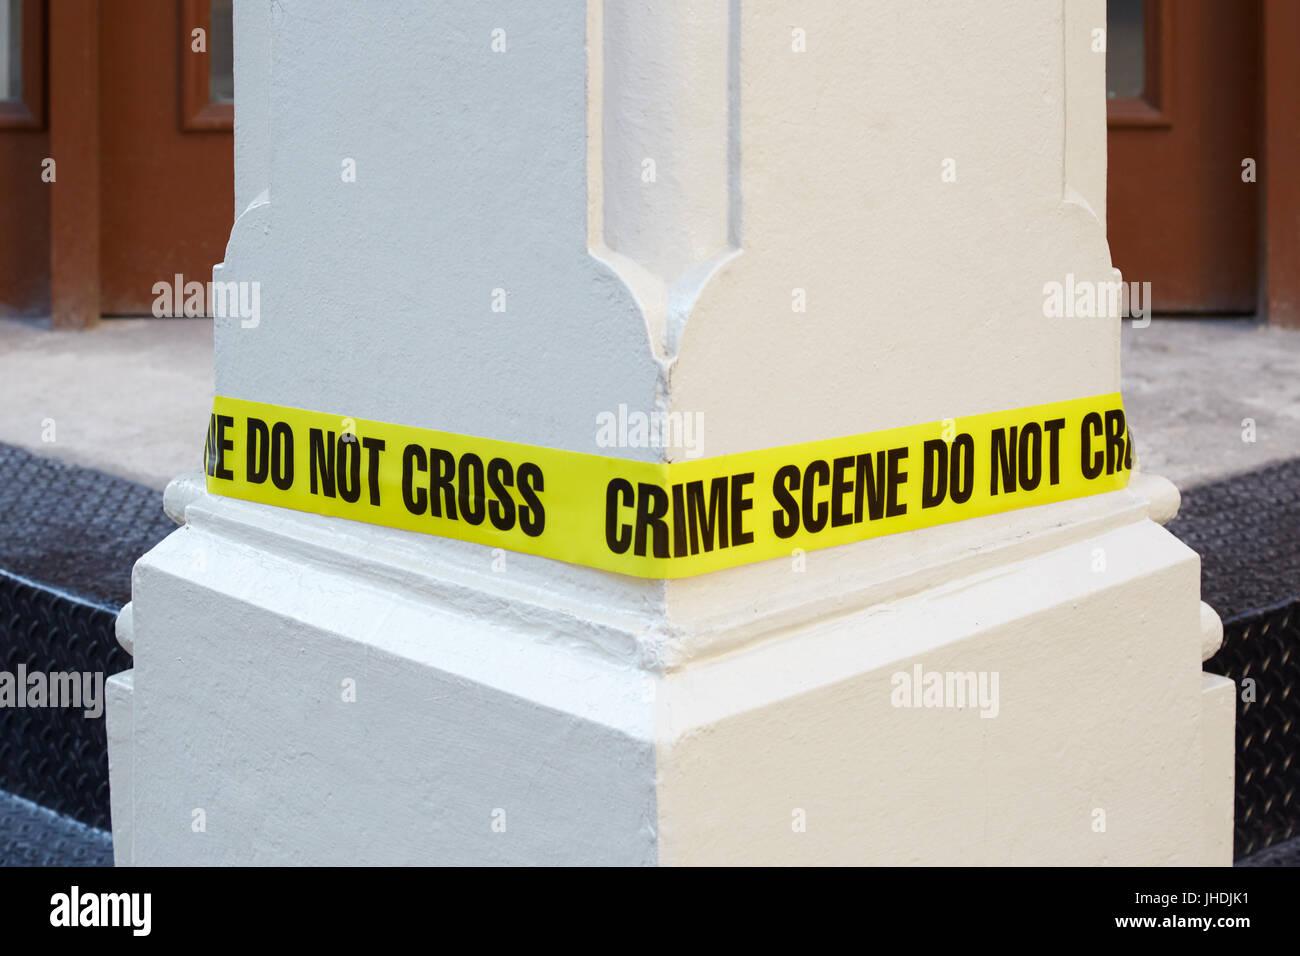 Crime scene do not cross, yellow police tape around a white column - Stock Image